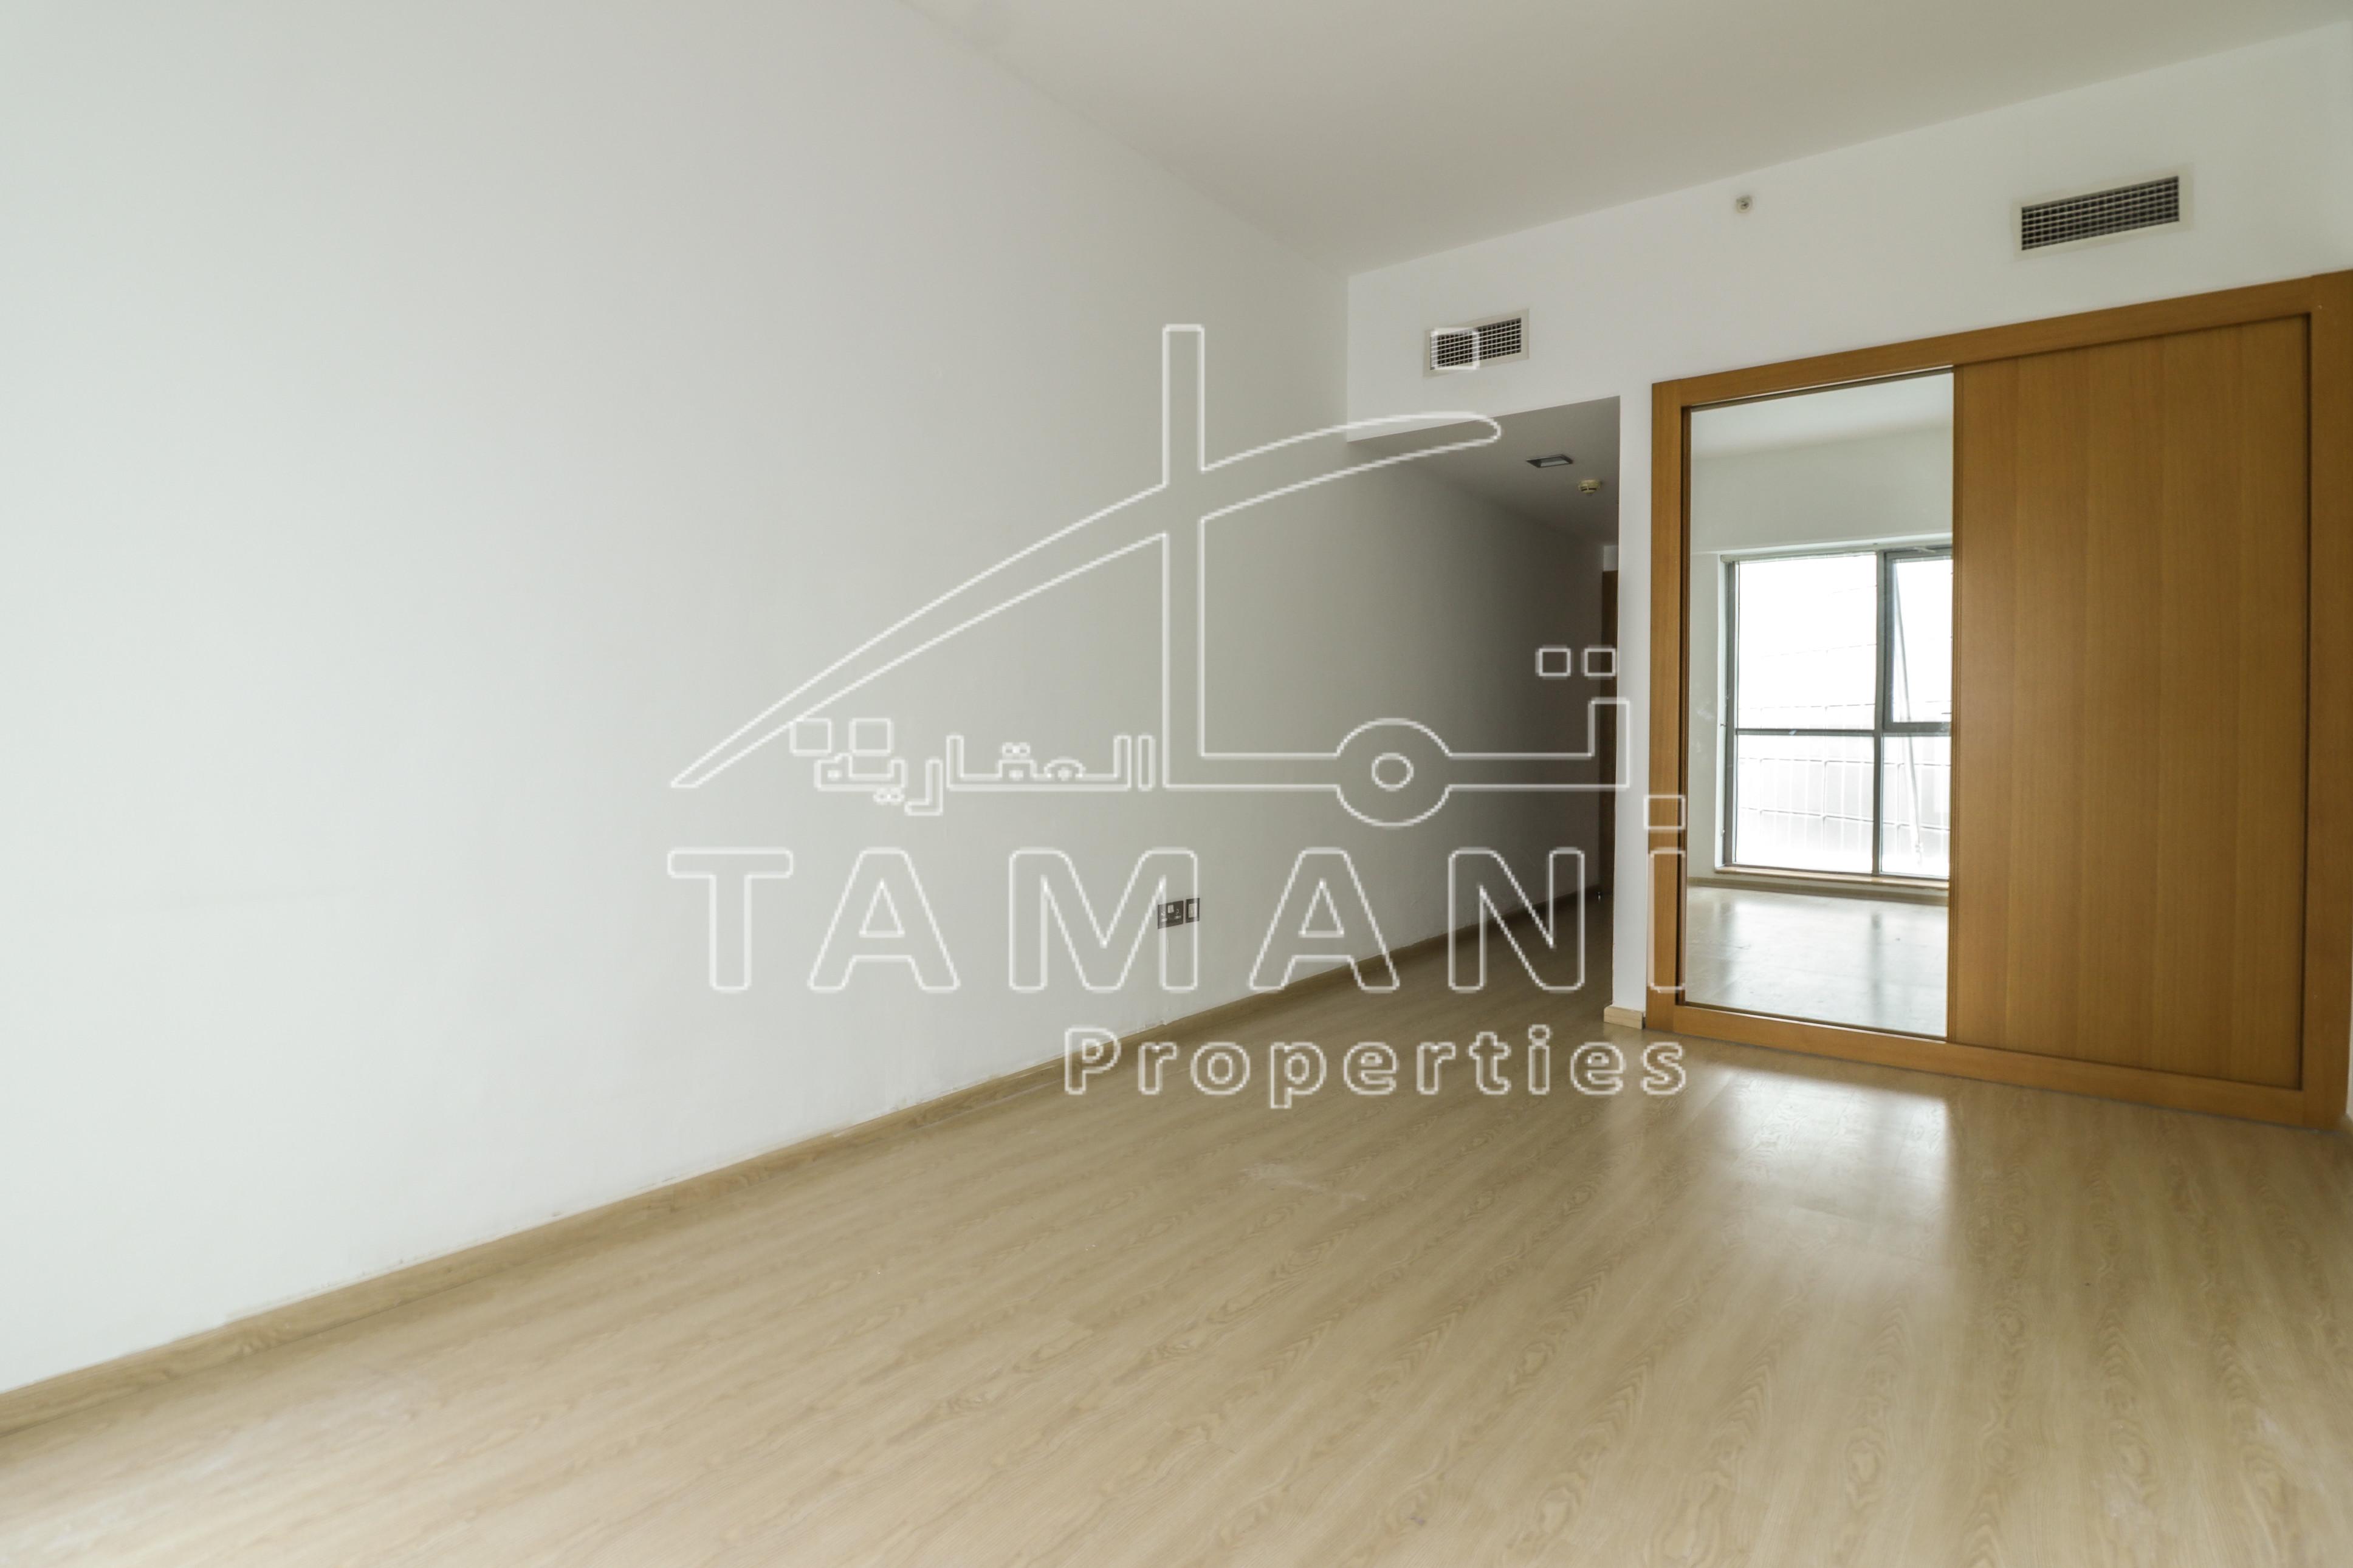 Duplex En-suite 4br |Maid room | storage - Executive Towers